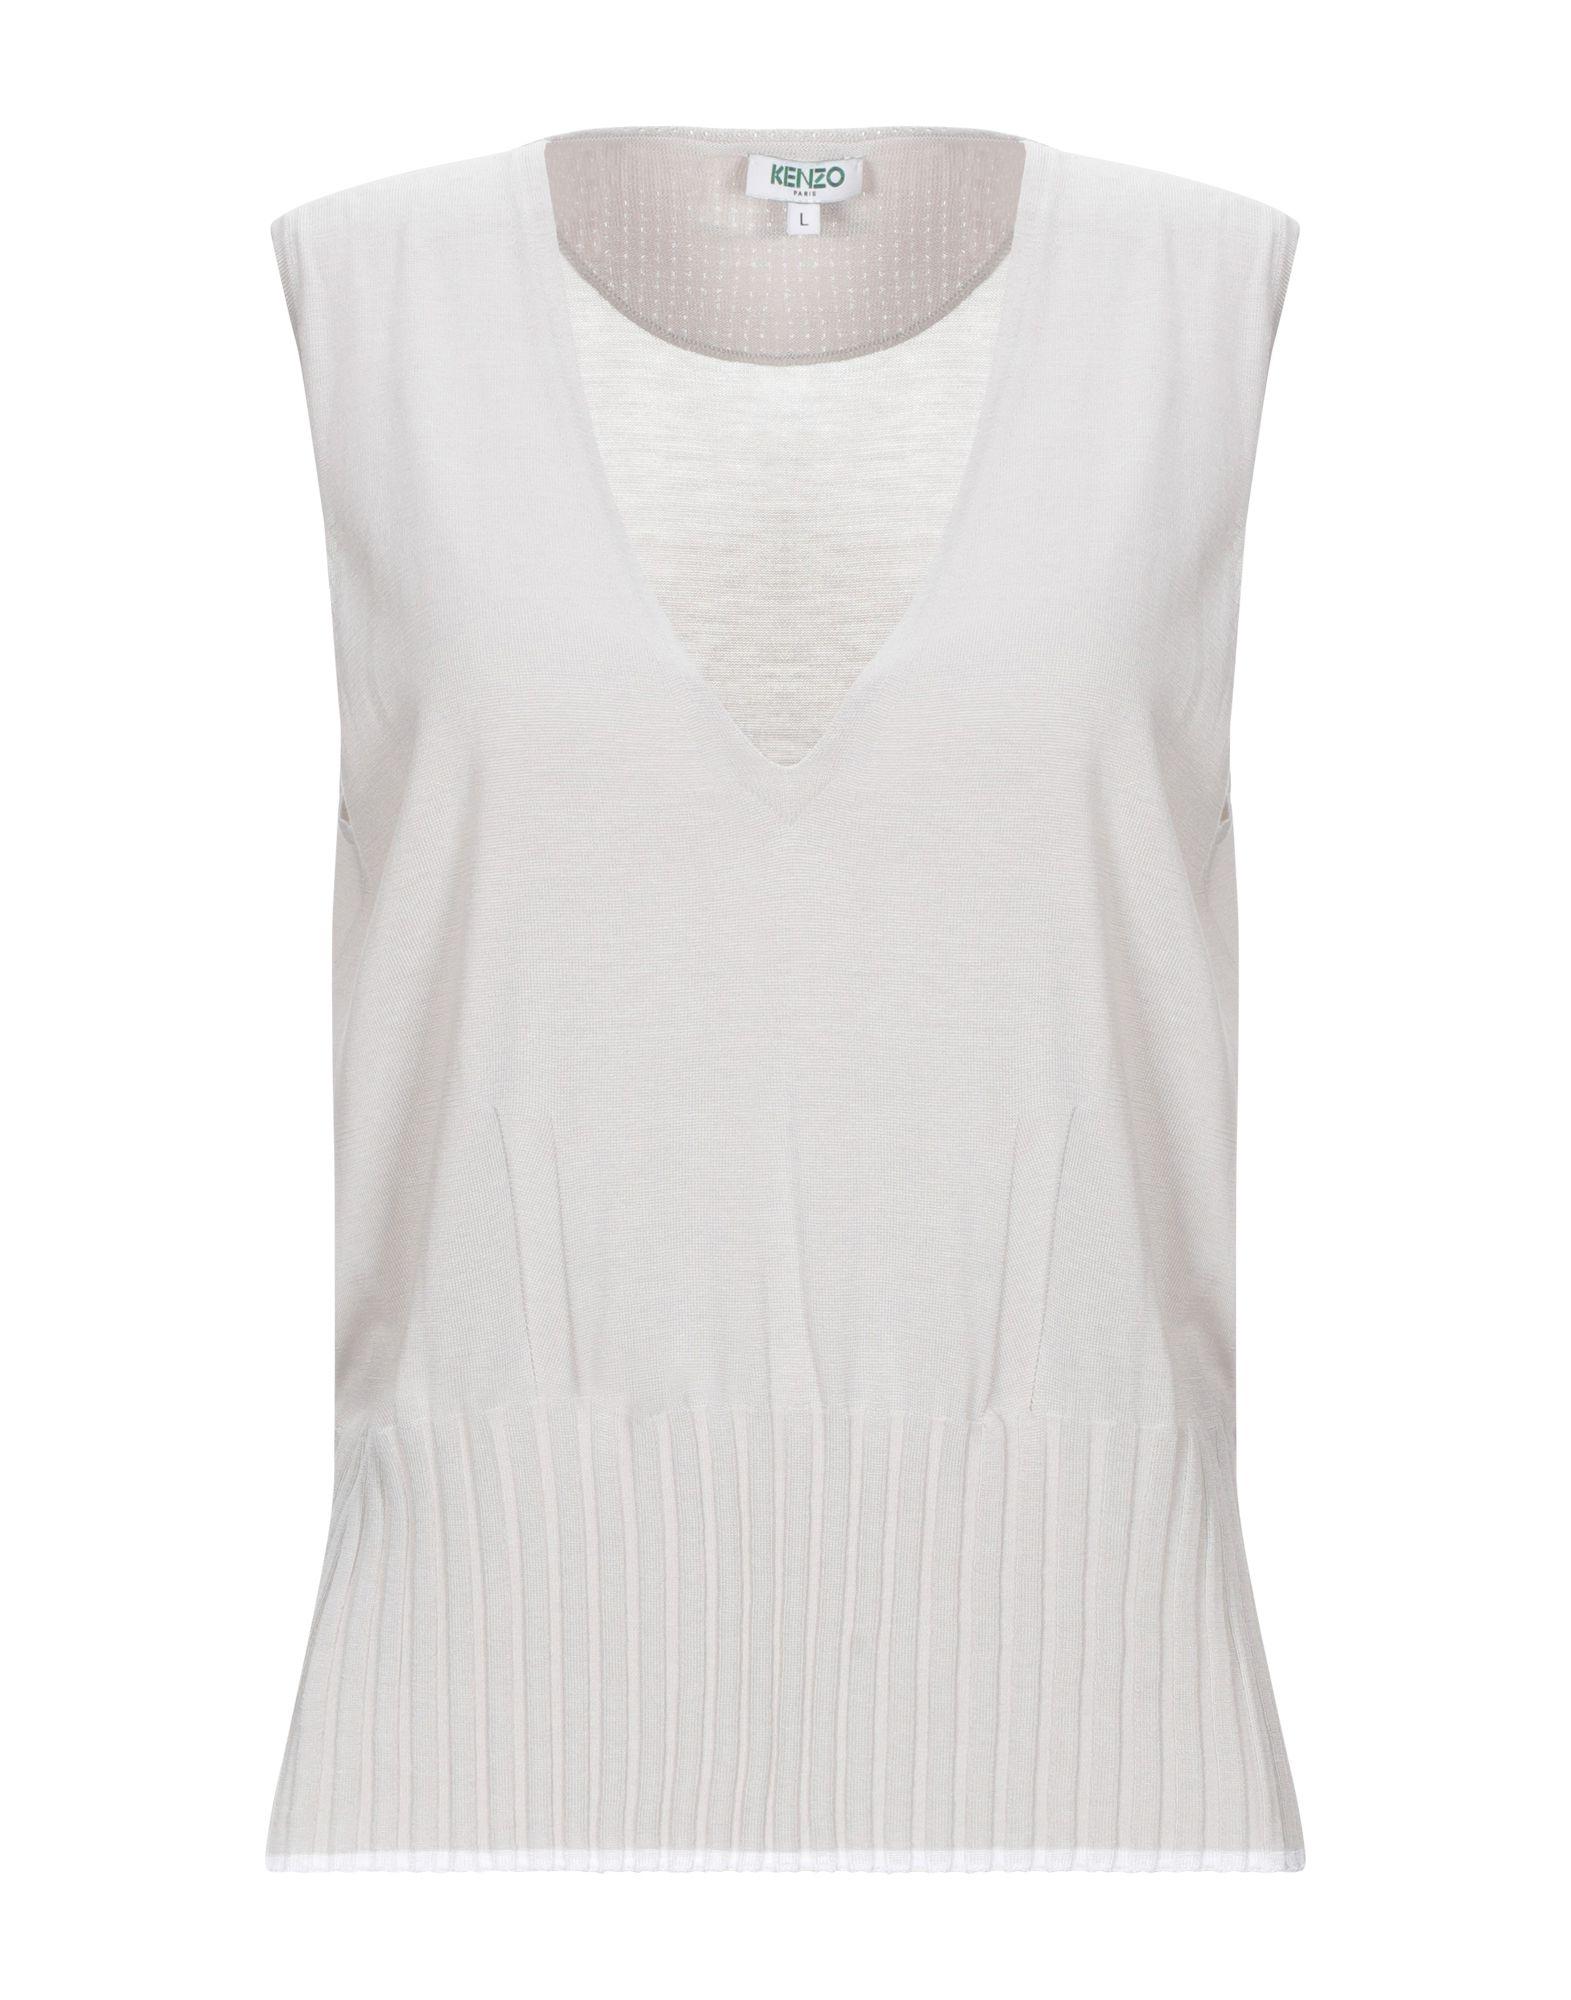 d13425098e1 Kenzo Sweater - Women Kenzo Sweaters online on YOOX United States -  12316990OX